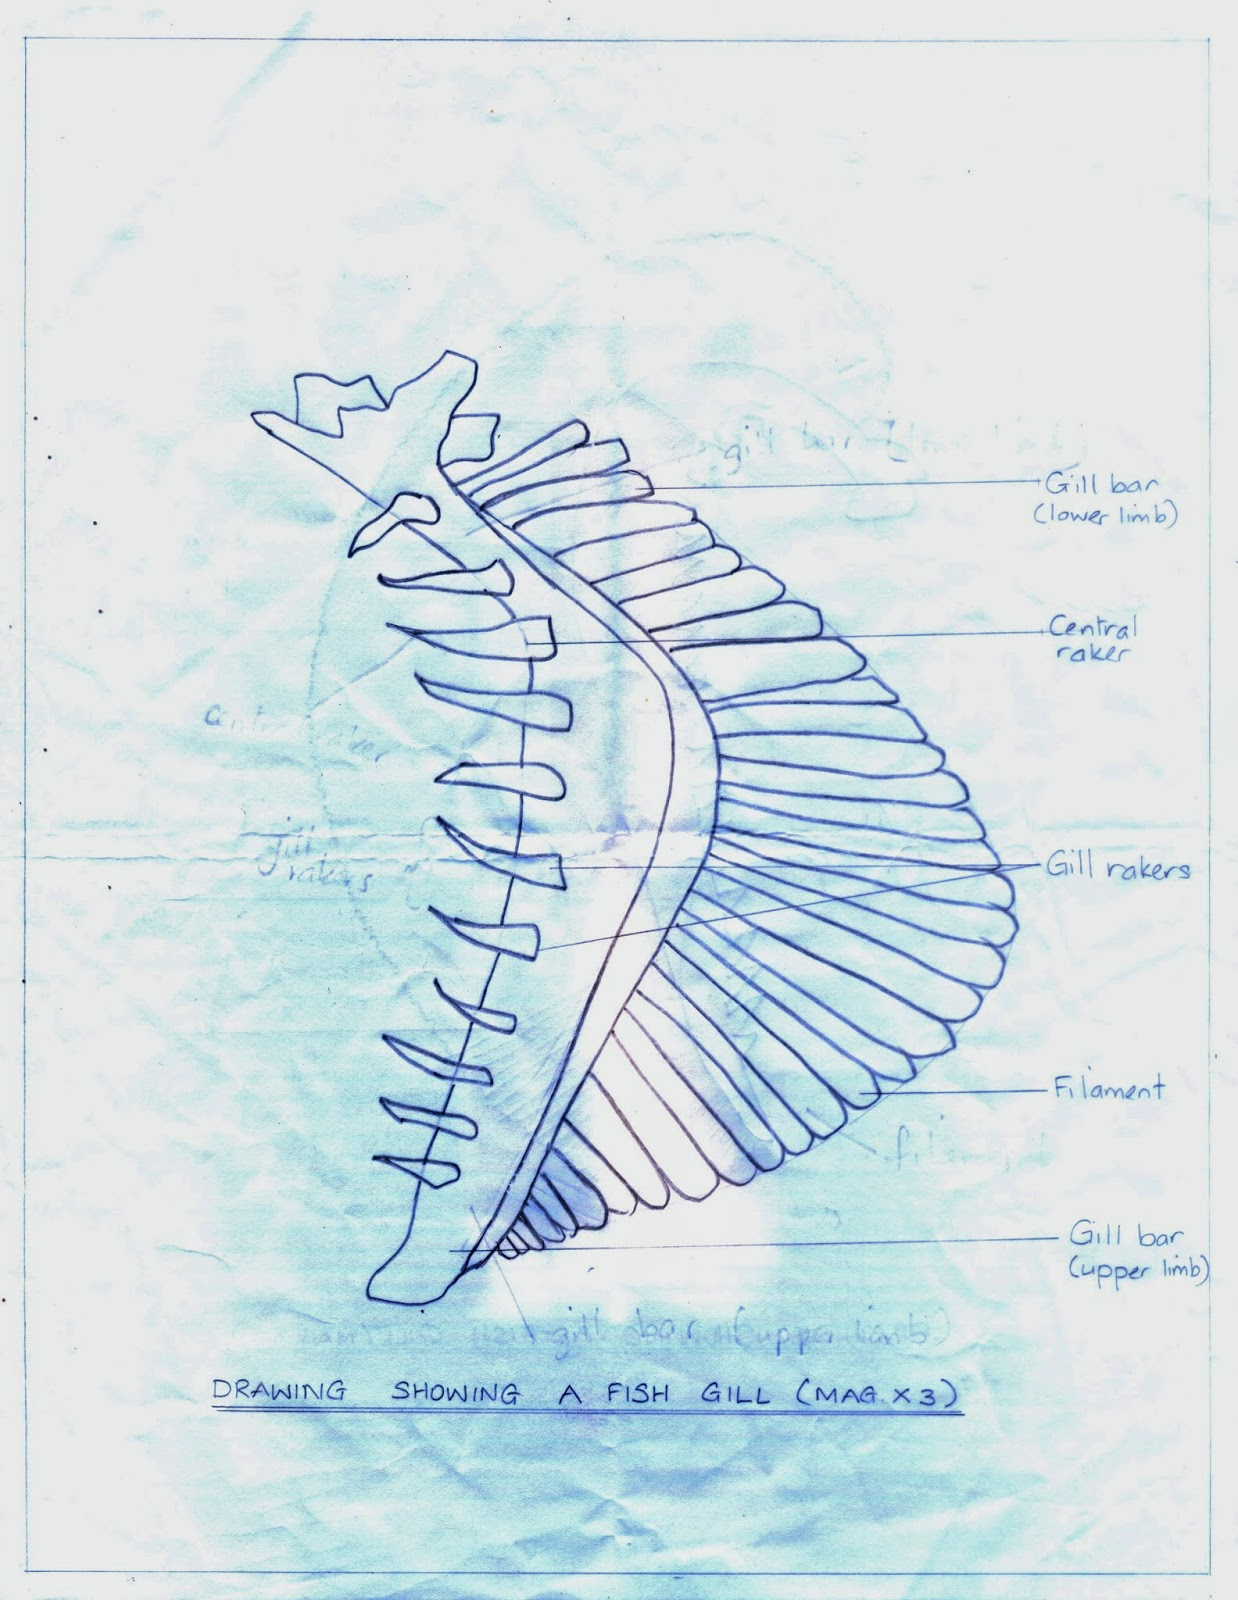 ameed 39 s secondary division blog biology sba diagram fish gill. Black Bedroom Furniture Sets. Home Design Ideas